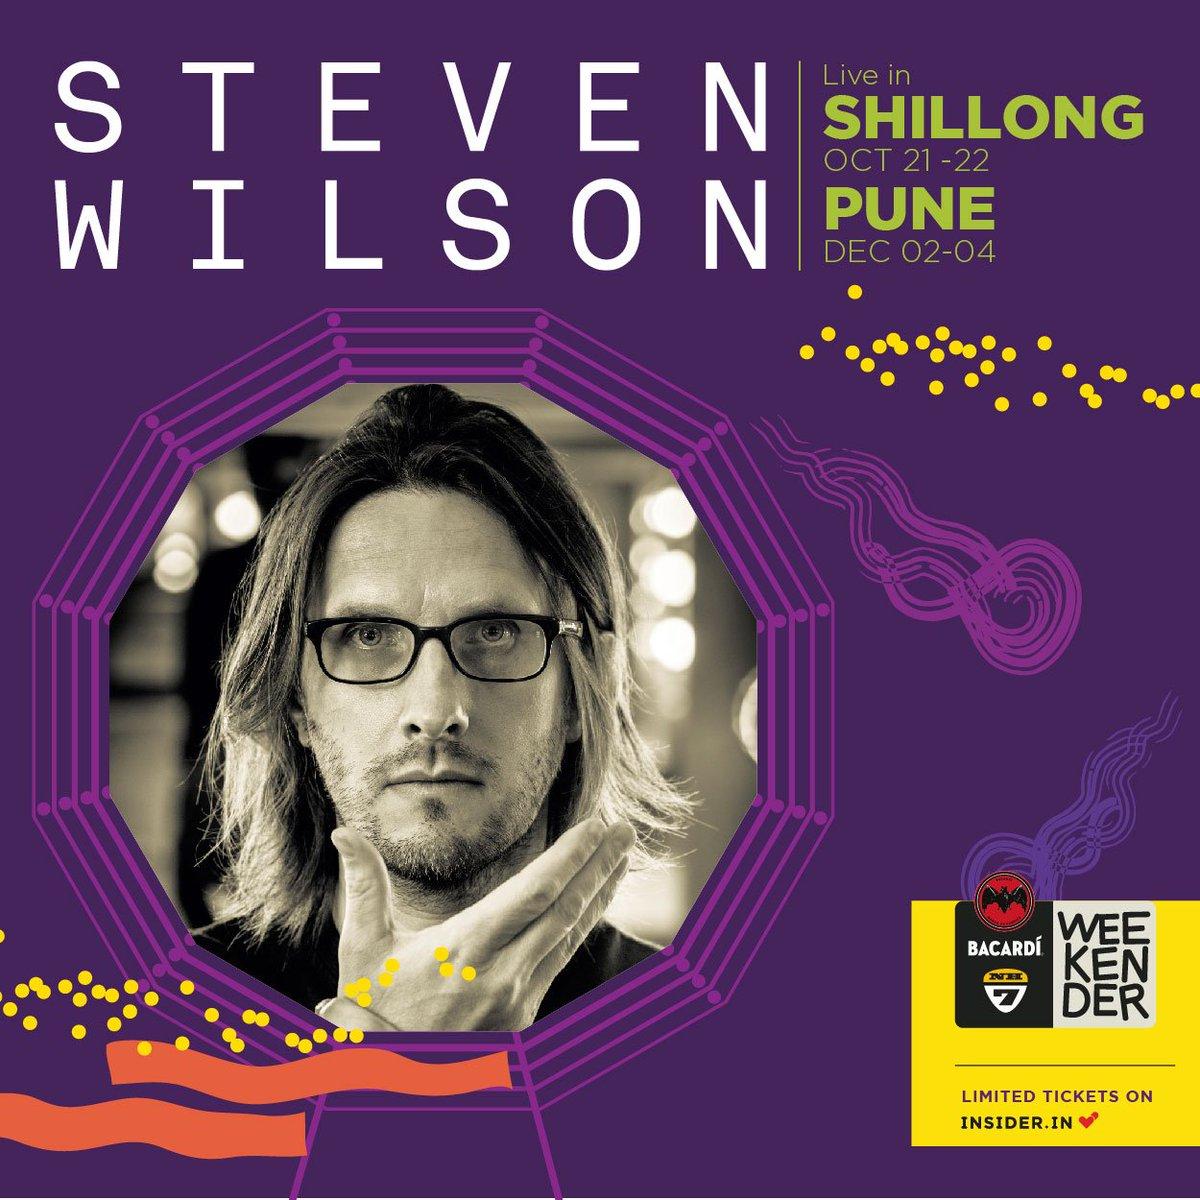 It's been a long wait. Don't hate me. @StevenWilsonHQ live at Bacardi NH7 Weekender Shillong and Pune. #lineup2016. https://t.co/xcN15YQ07U